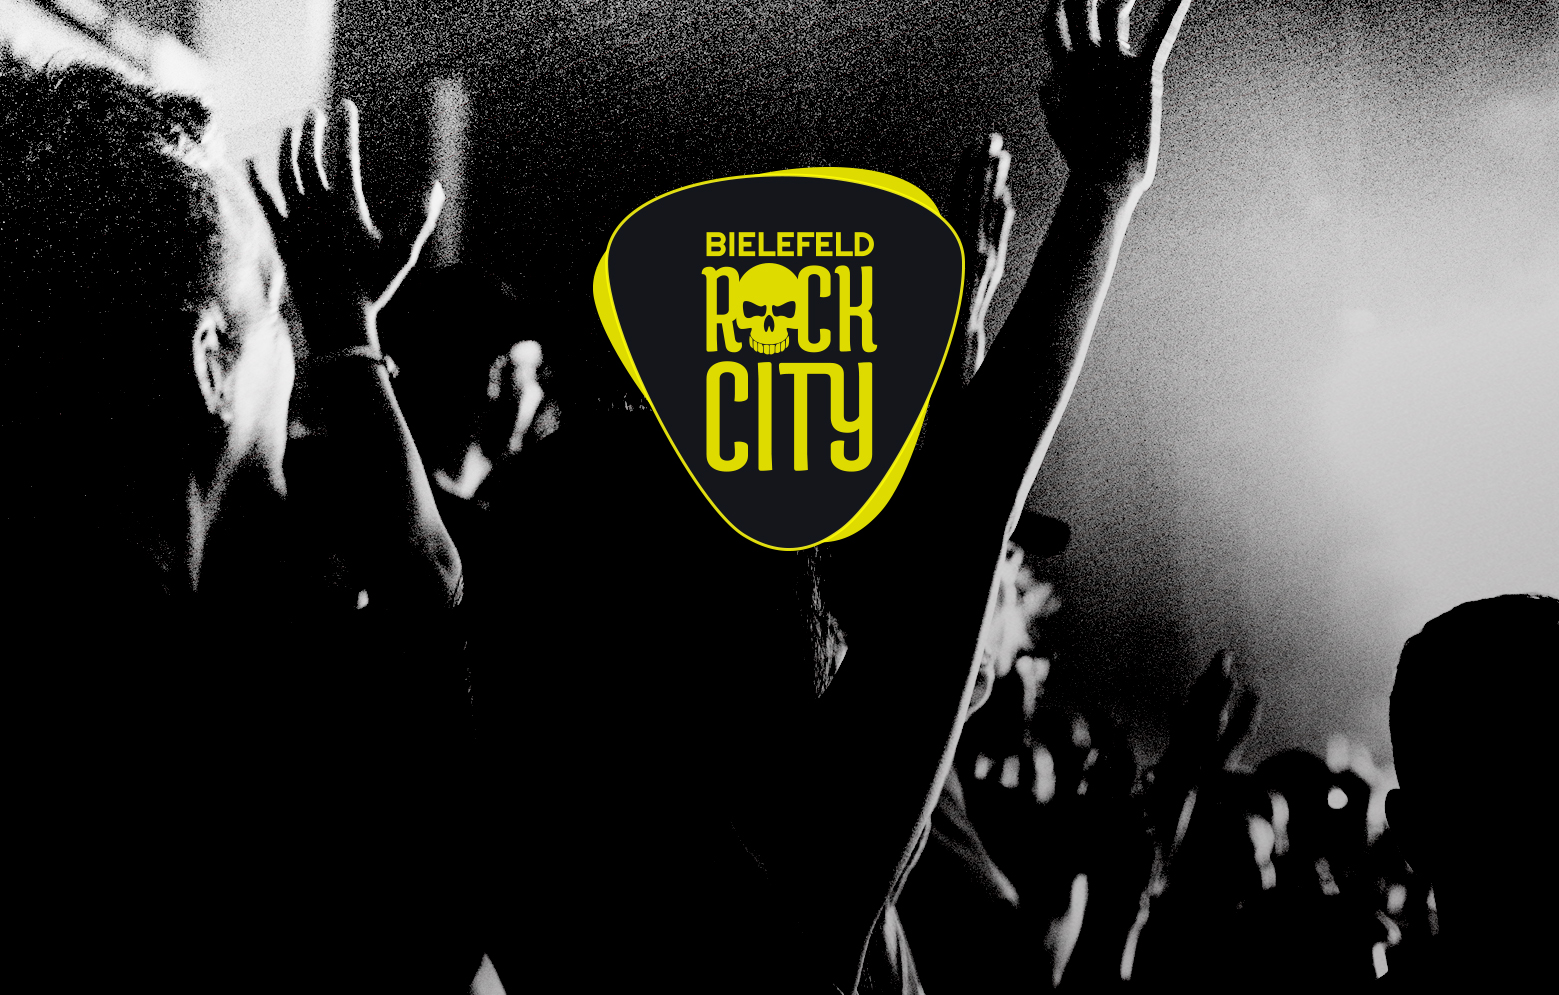 Hintergrundbild mit Bielefeld Rock City Logo